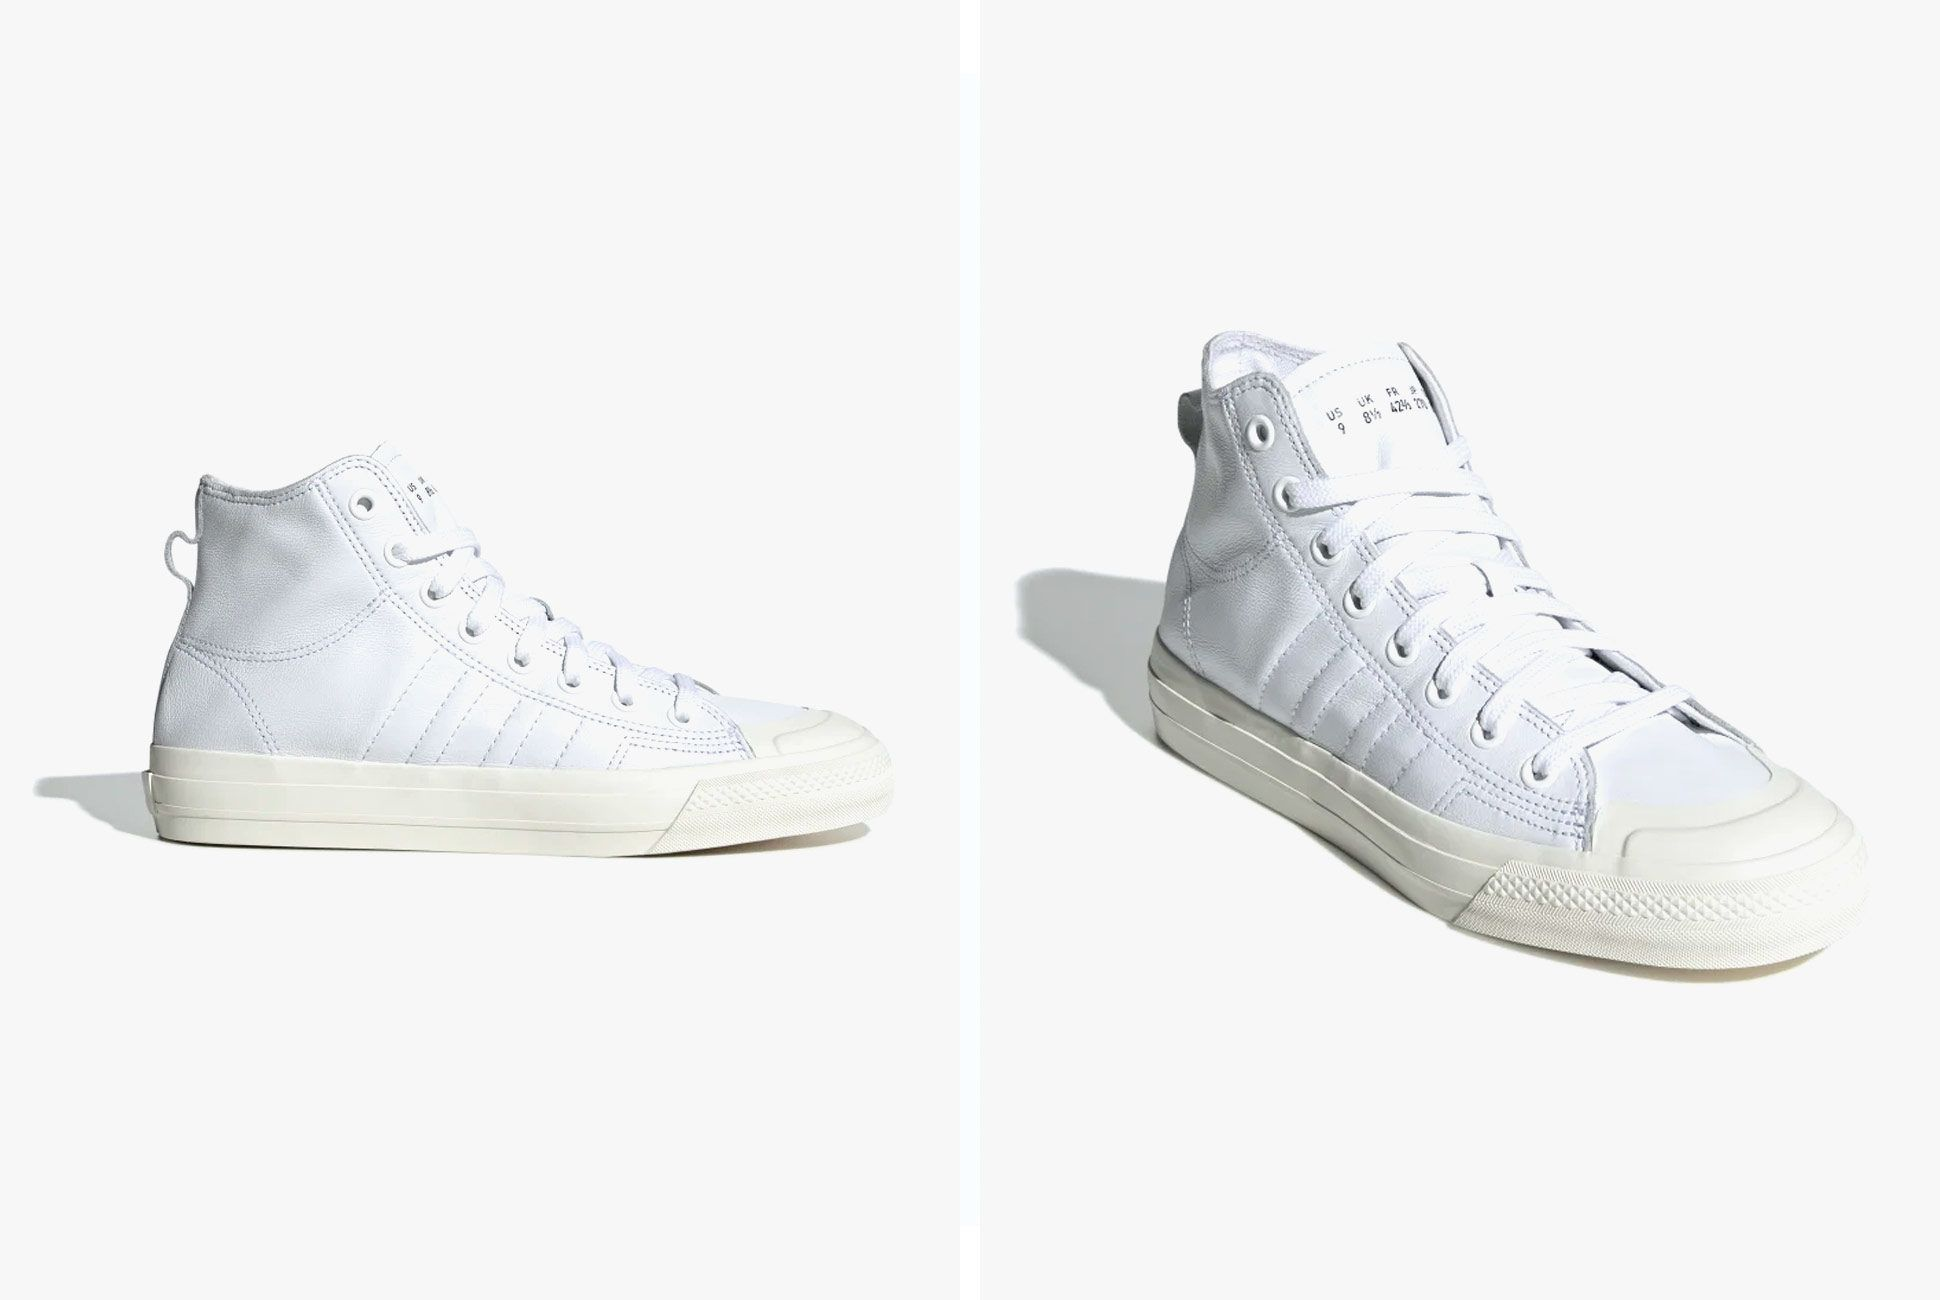 Adidas-Classics-Collection-gear-patrol-slide-3